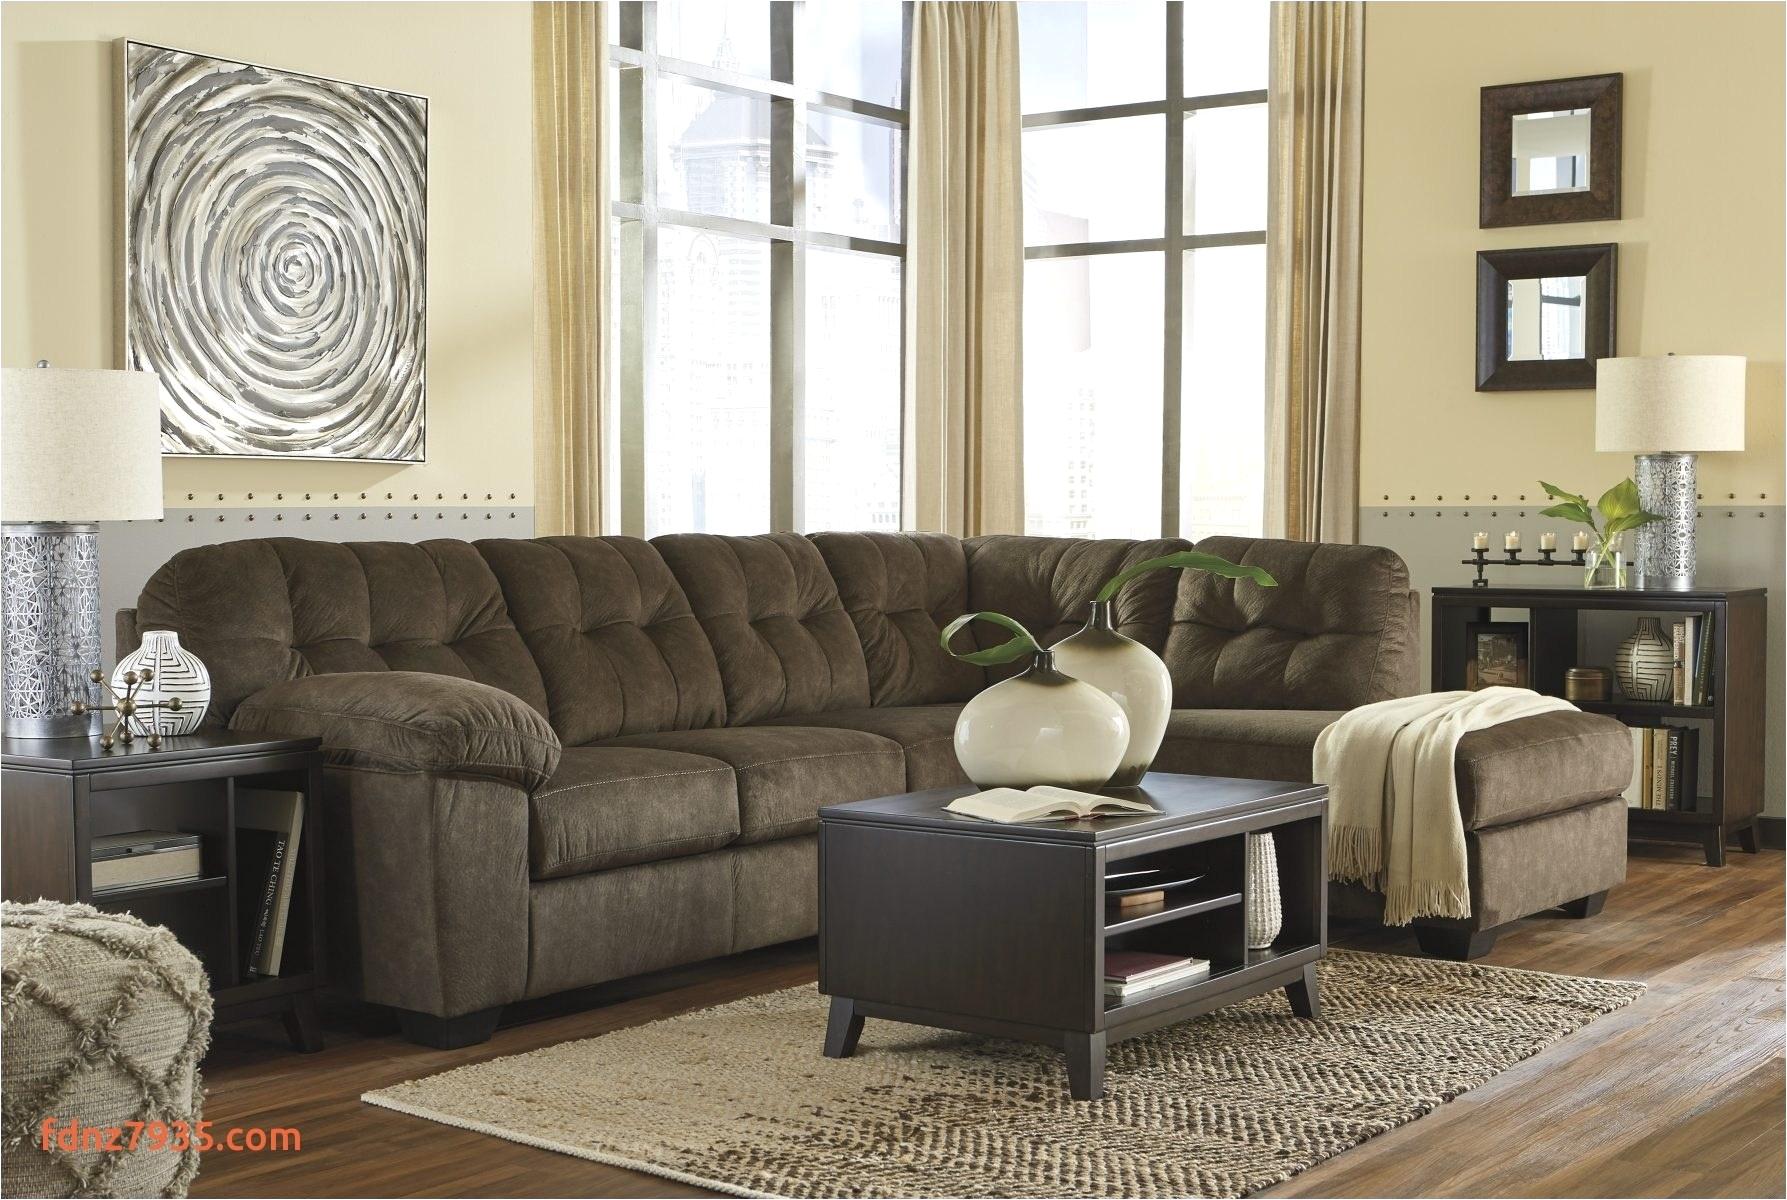 furniture stores joplin mo ashley furniture sectional sofa fresh sofa design